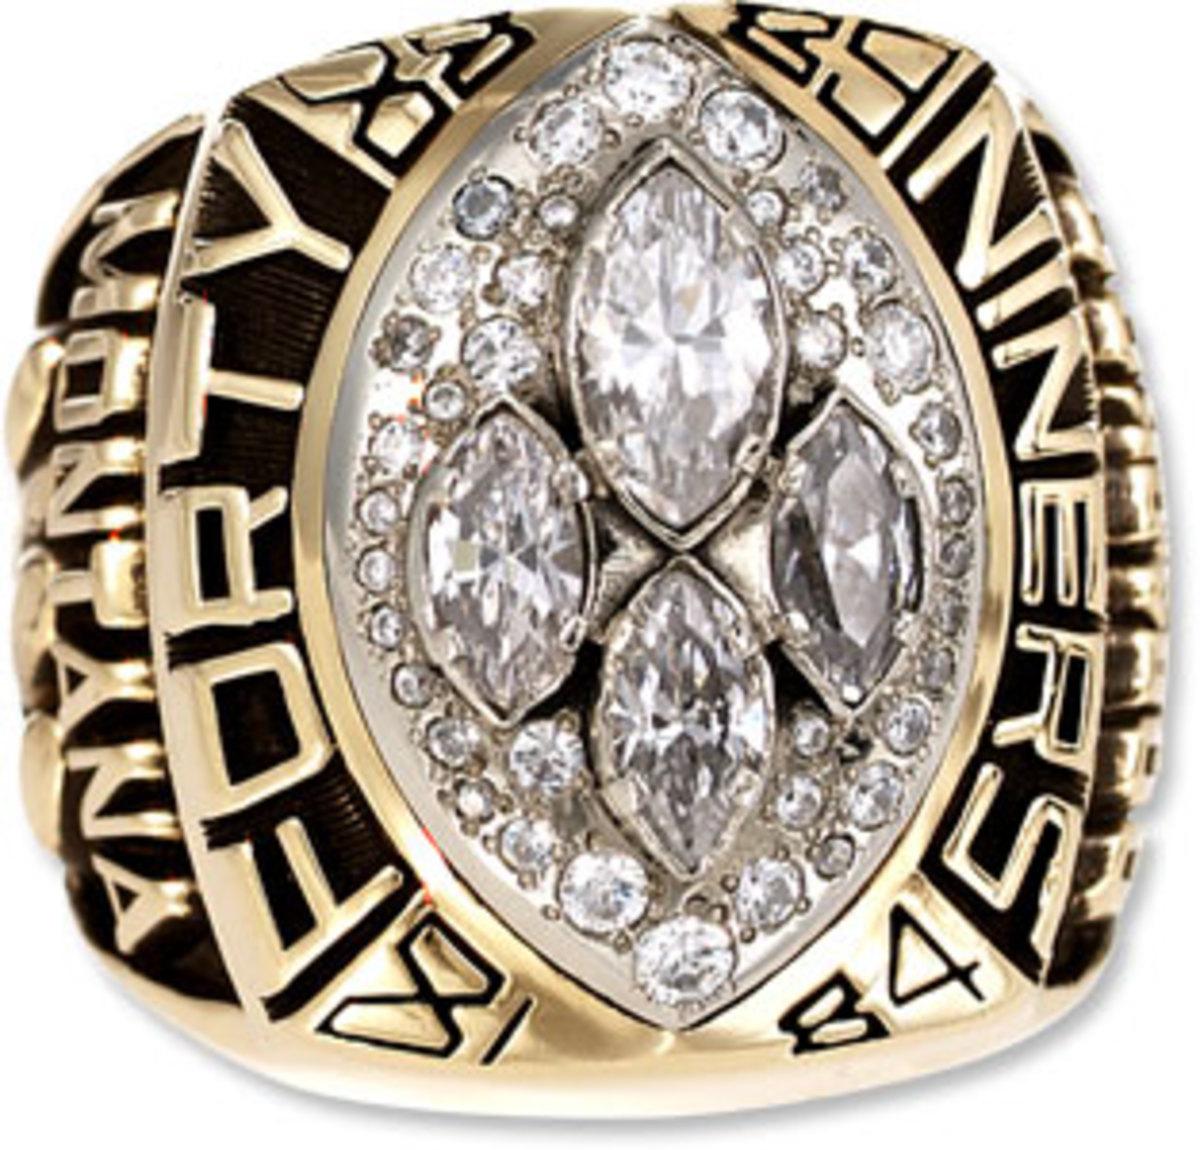 XXIV San Francisco Super Bowl Ring 1990